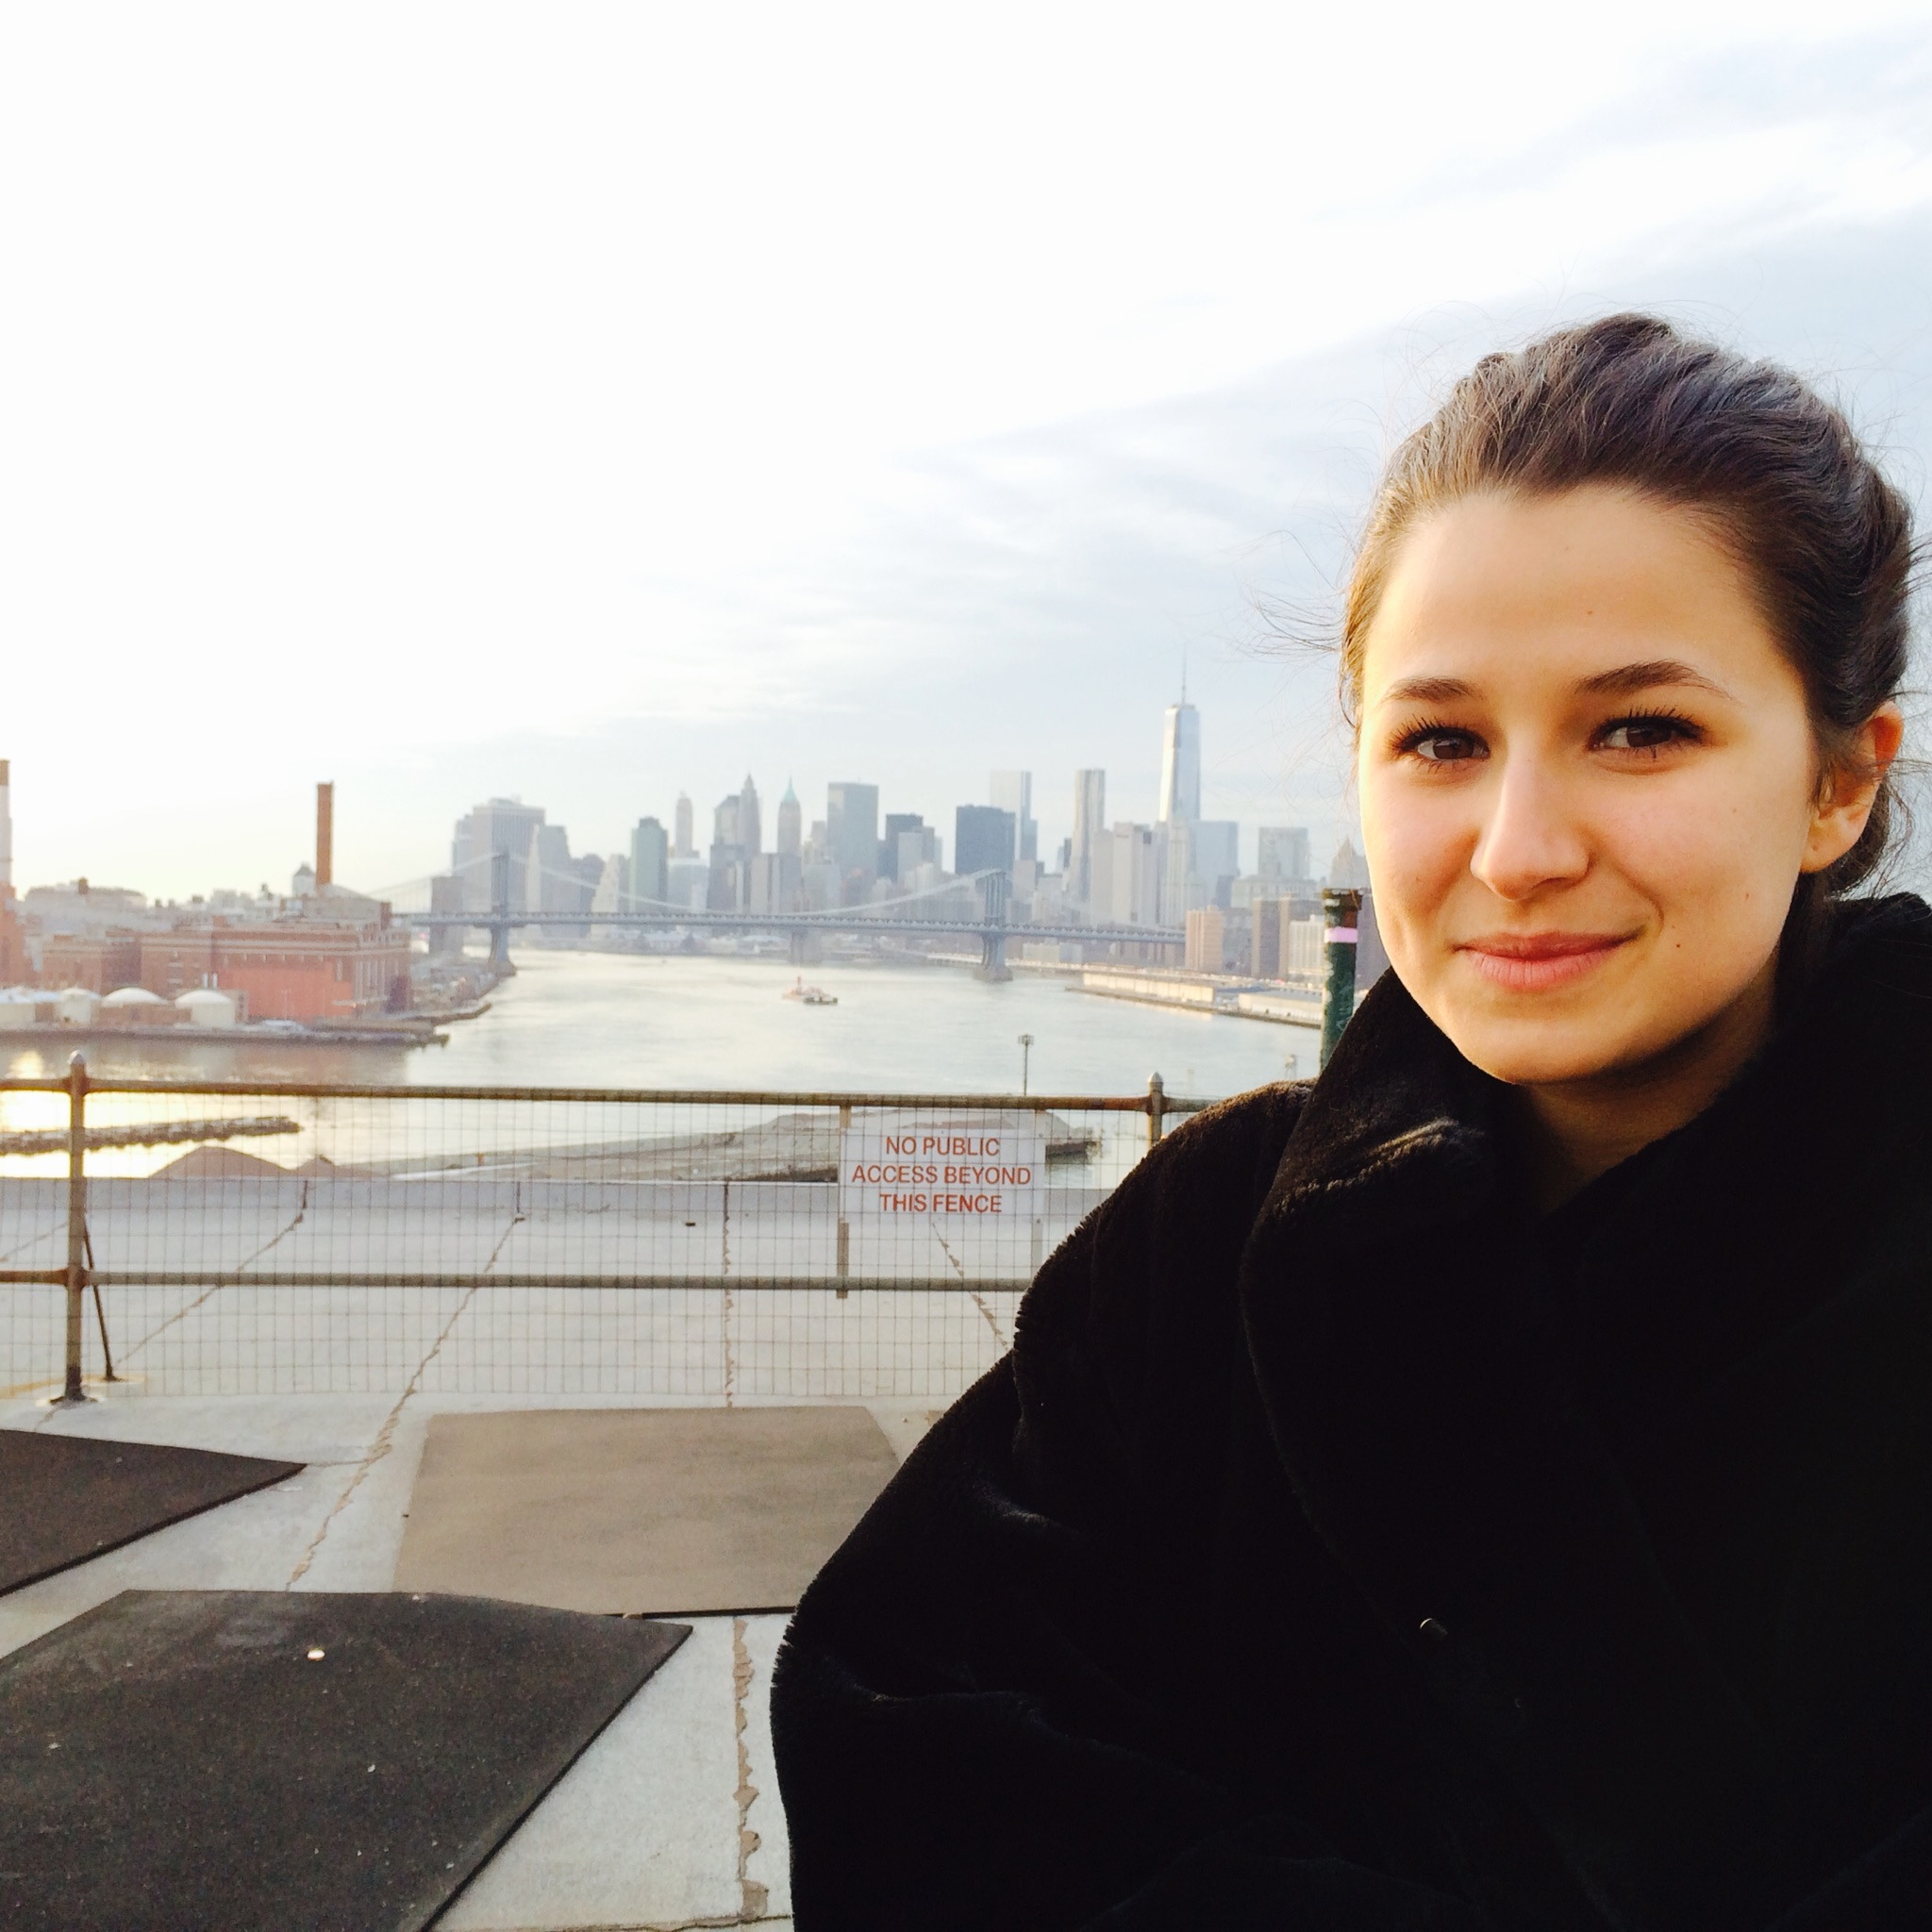 Big-Apple-Sandrine-New-York